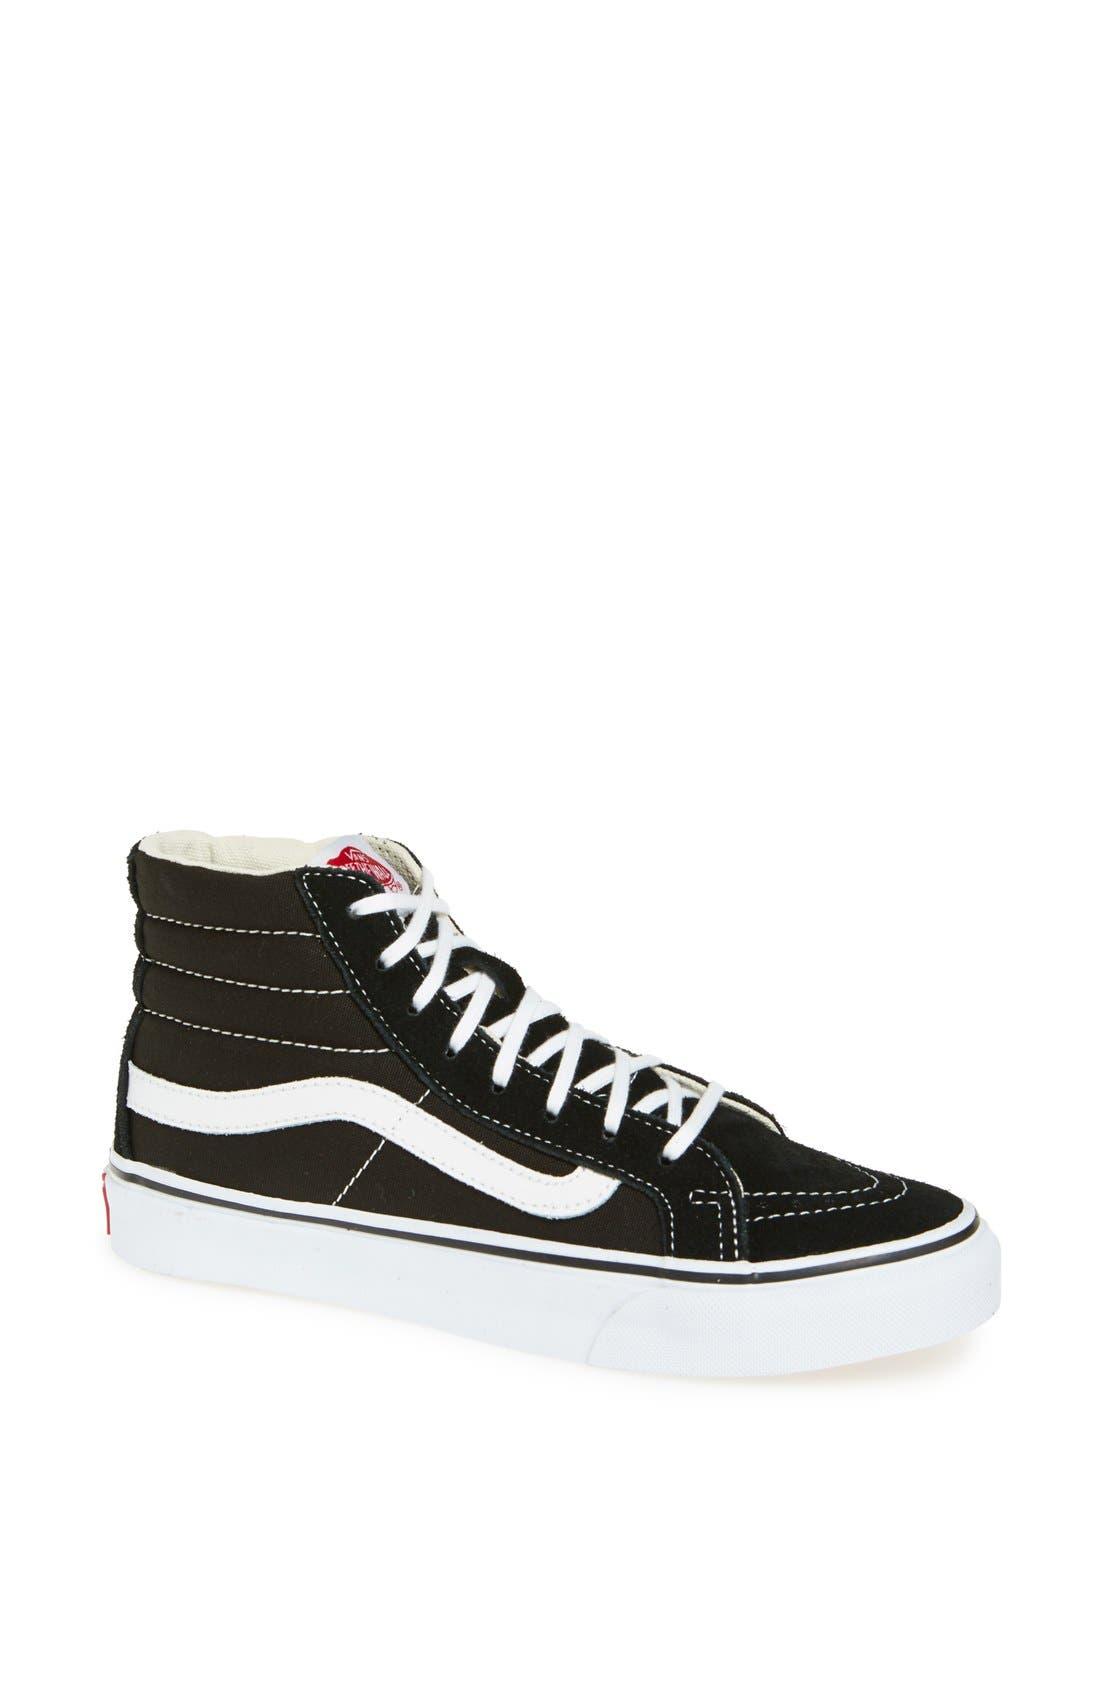 VANS Sk8-Hi Slim High Top Sneaker, Main, color, BLACK TRUE WHITE